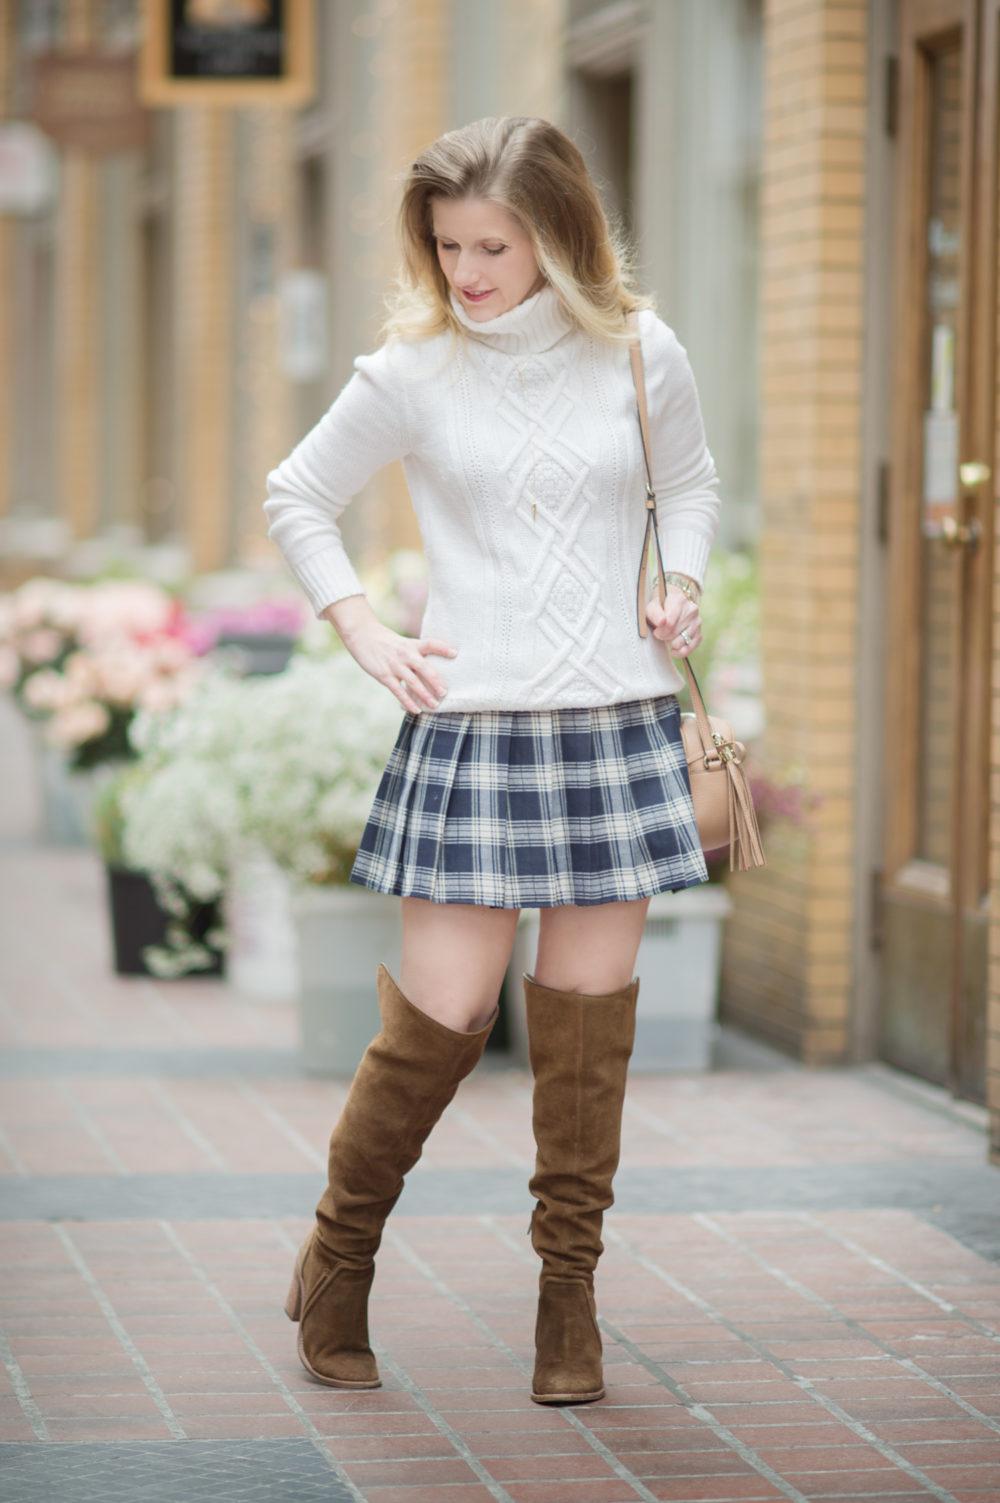 Petite Fashion and Style Blog | Fashion for Petite Women | J. Crew Cambridge Cable Crewneck Sweater